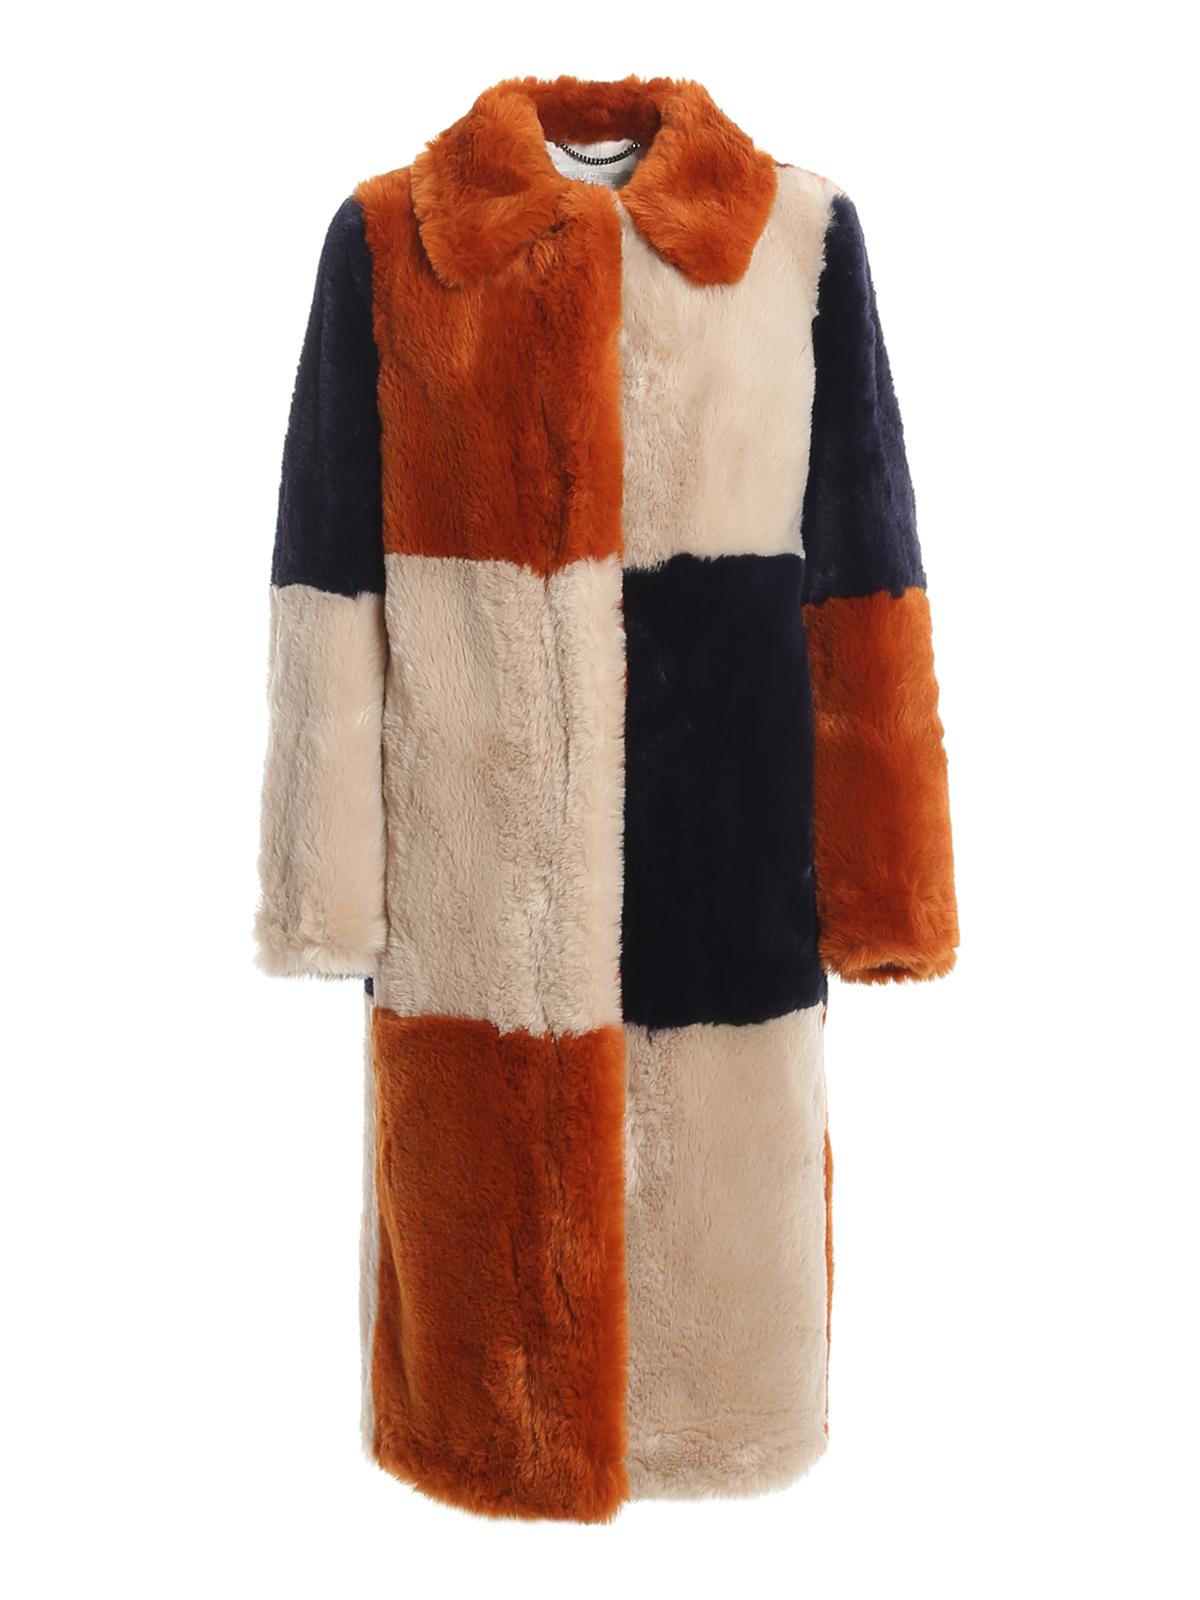 Stella Mccartney Furs ADALYN ECO FUR COAT